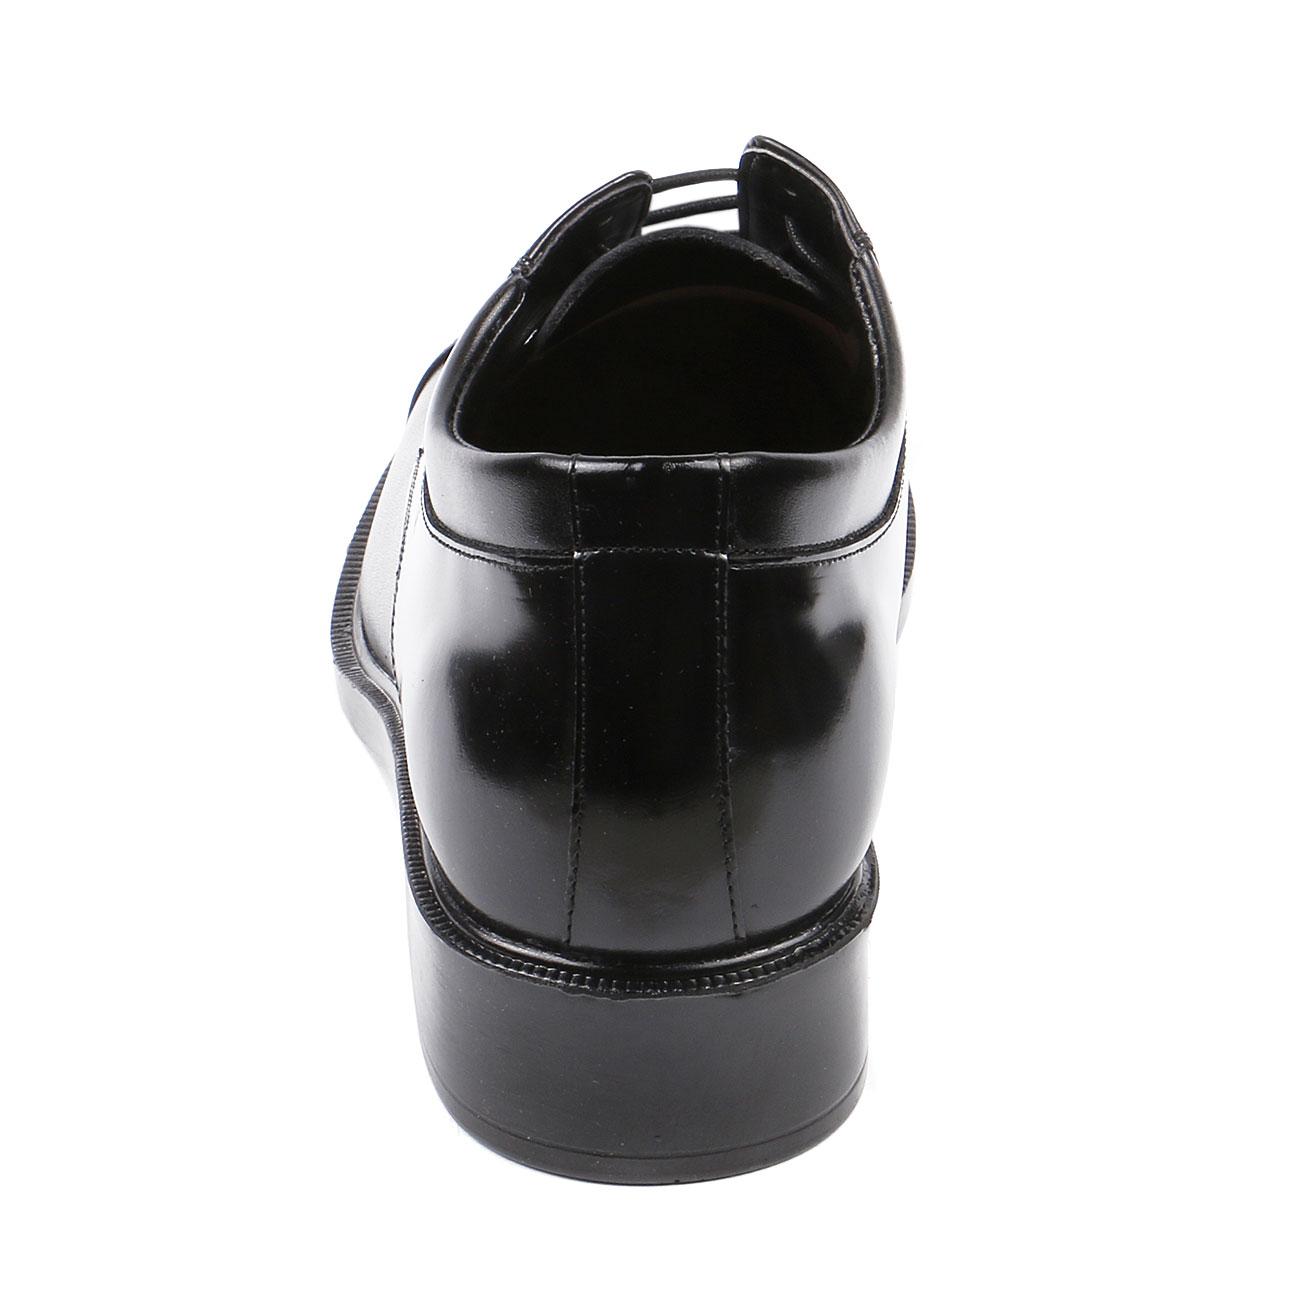 Height Increasing Shoe, Comfy & Ultra Light For Short Men  2.4